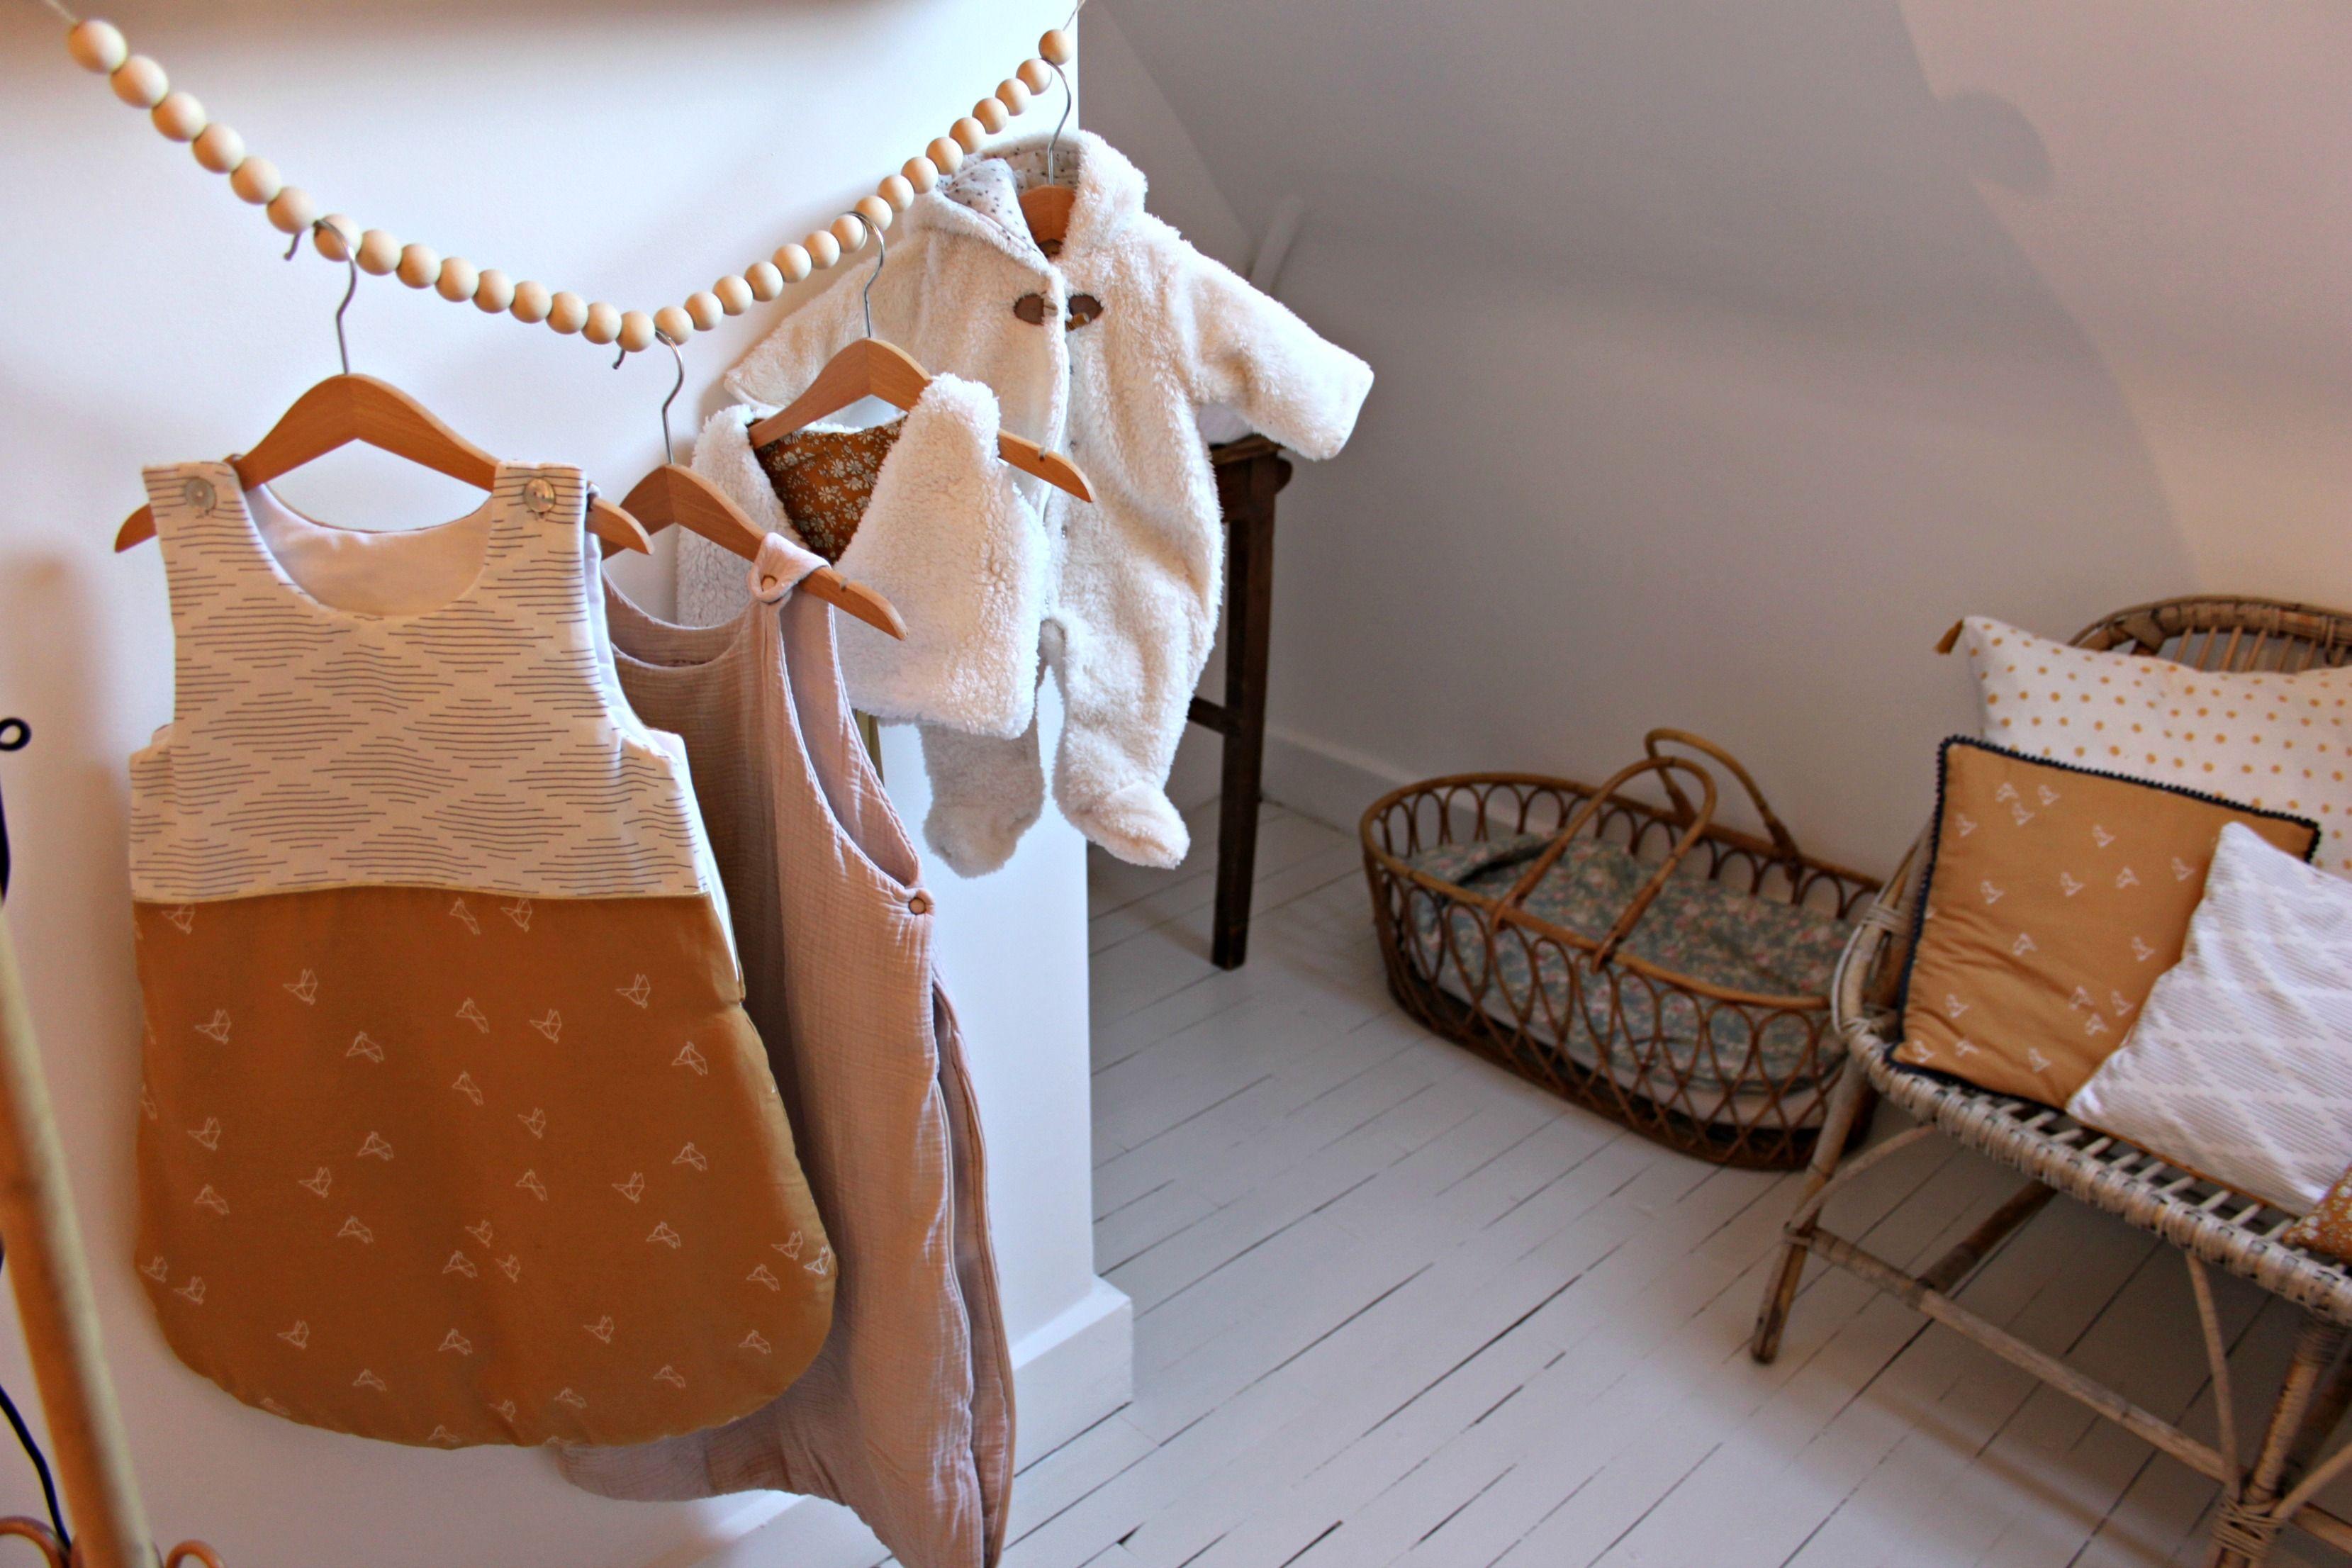 chambre b b vintage rotin penderie diy perle deco vintage atelier aimer vintage house. Black Bedroom Furniture Sets. Home Design Ideas